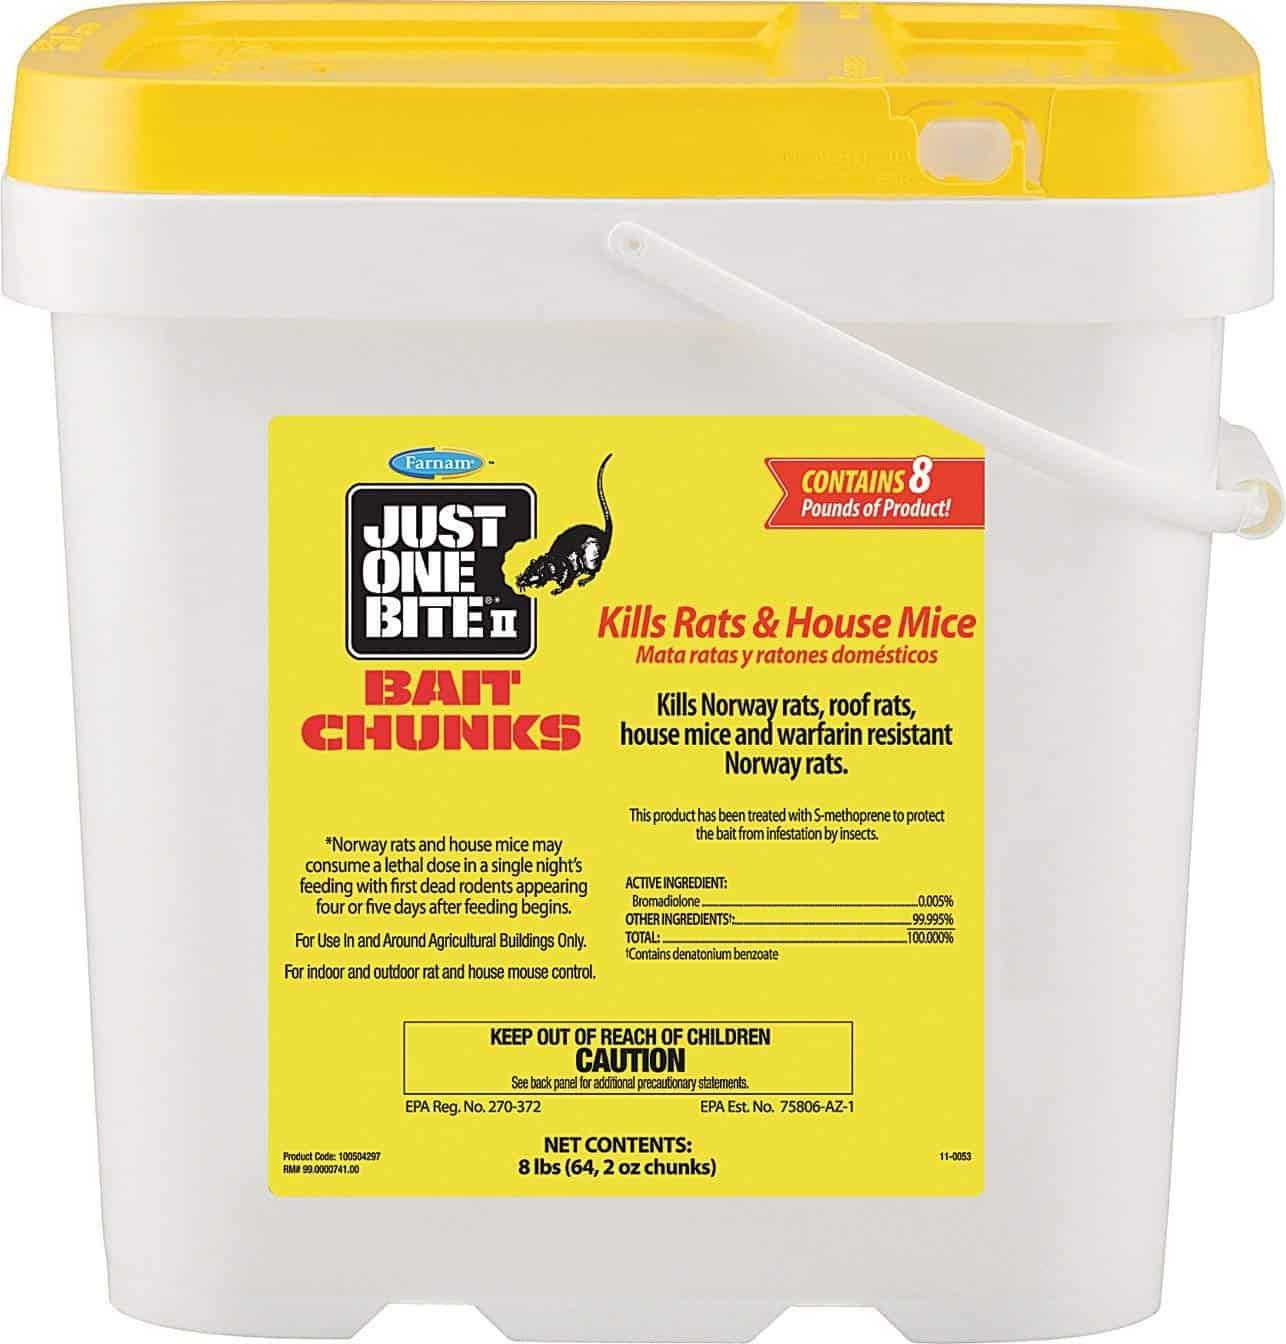 Farnam Just One Bite II Bait Chunks – Strong dose